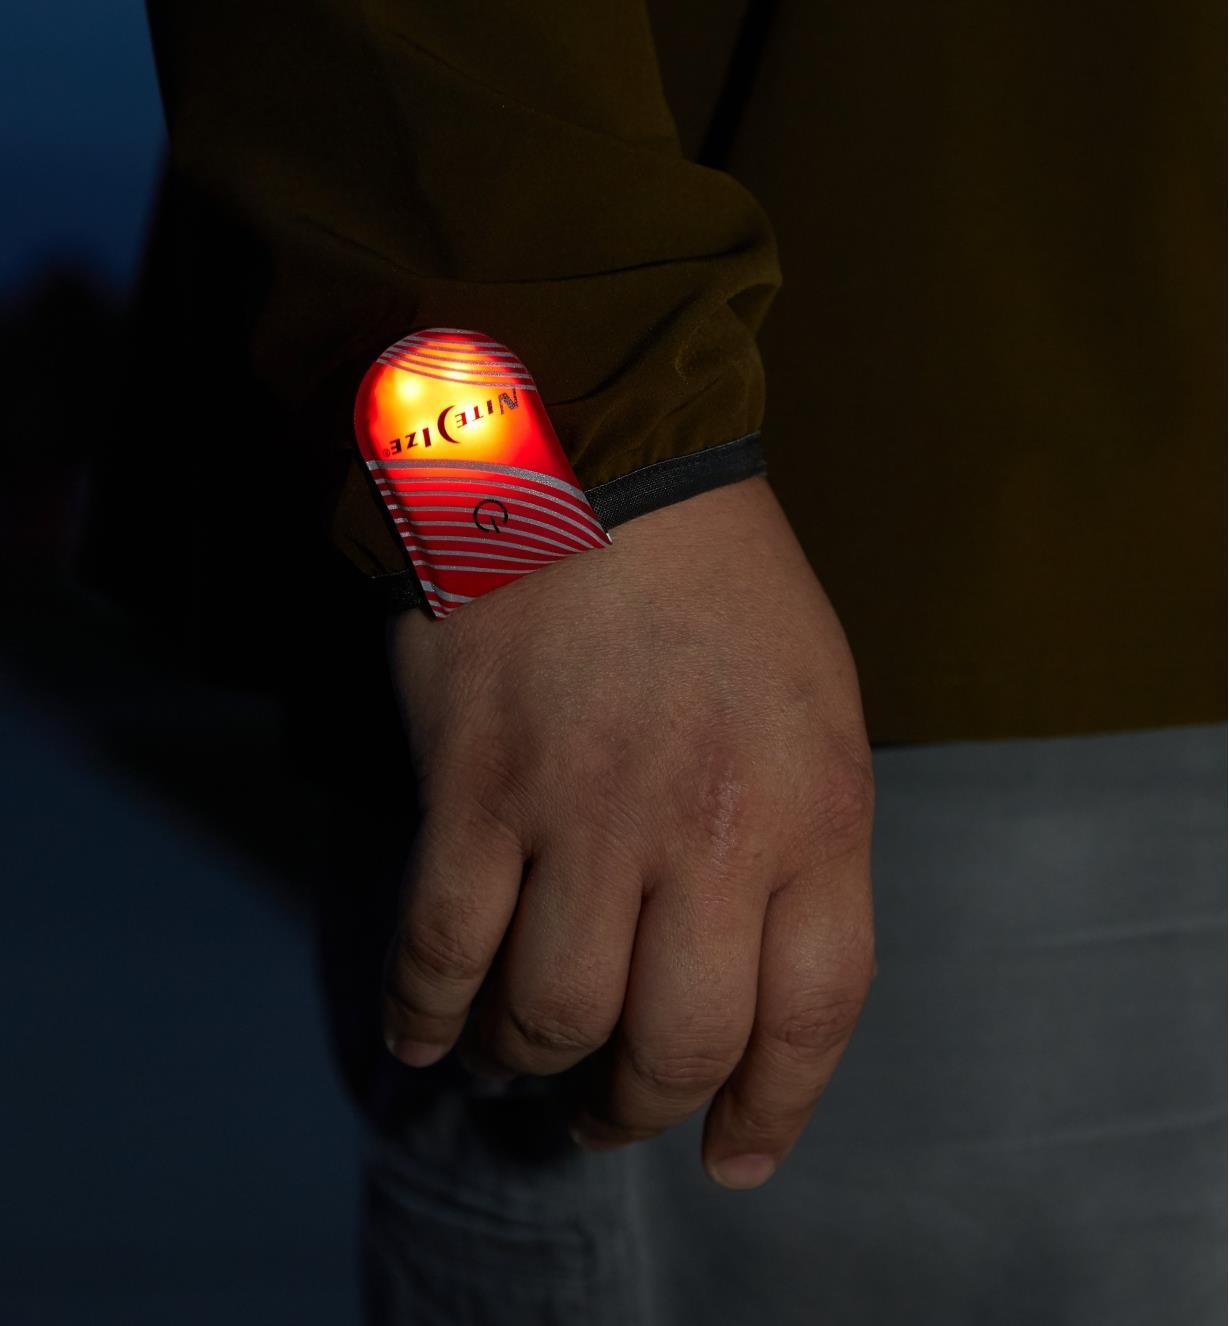 68K0960 - TagLit LED Marker